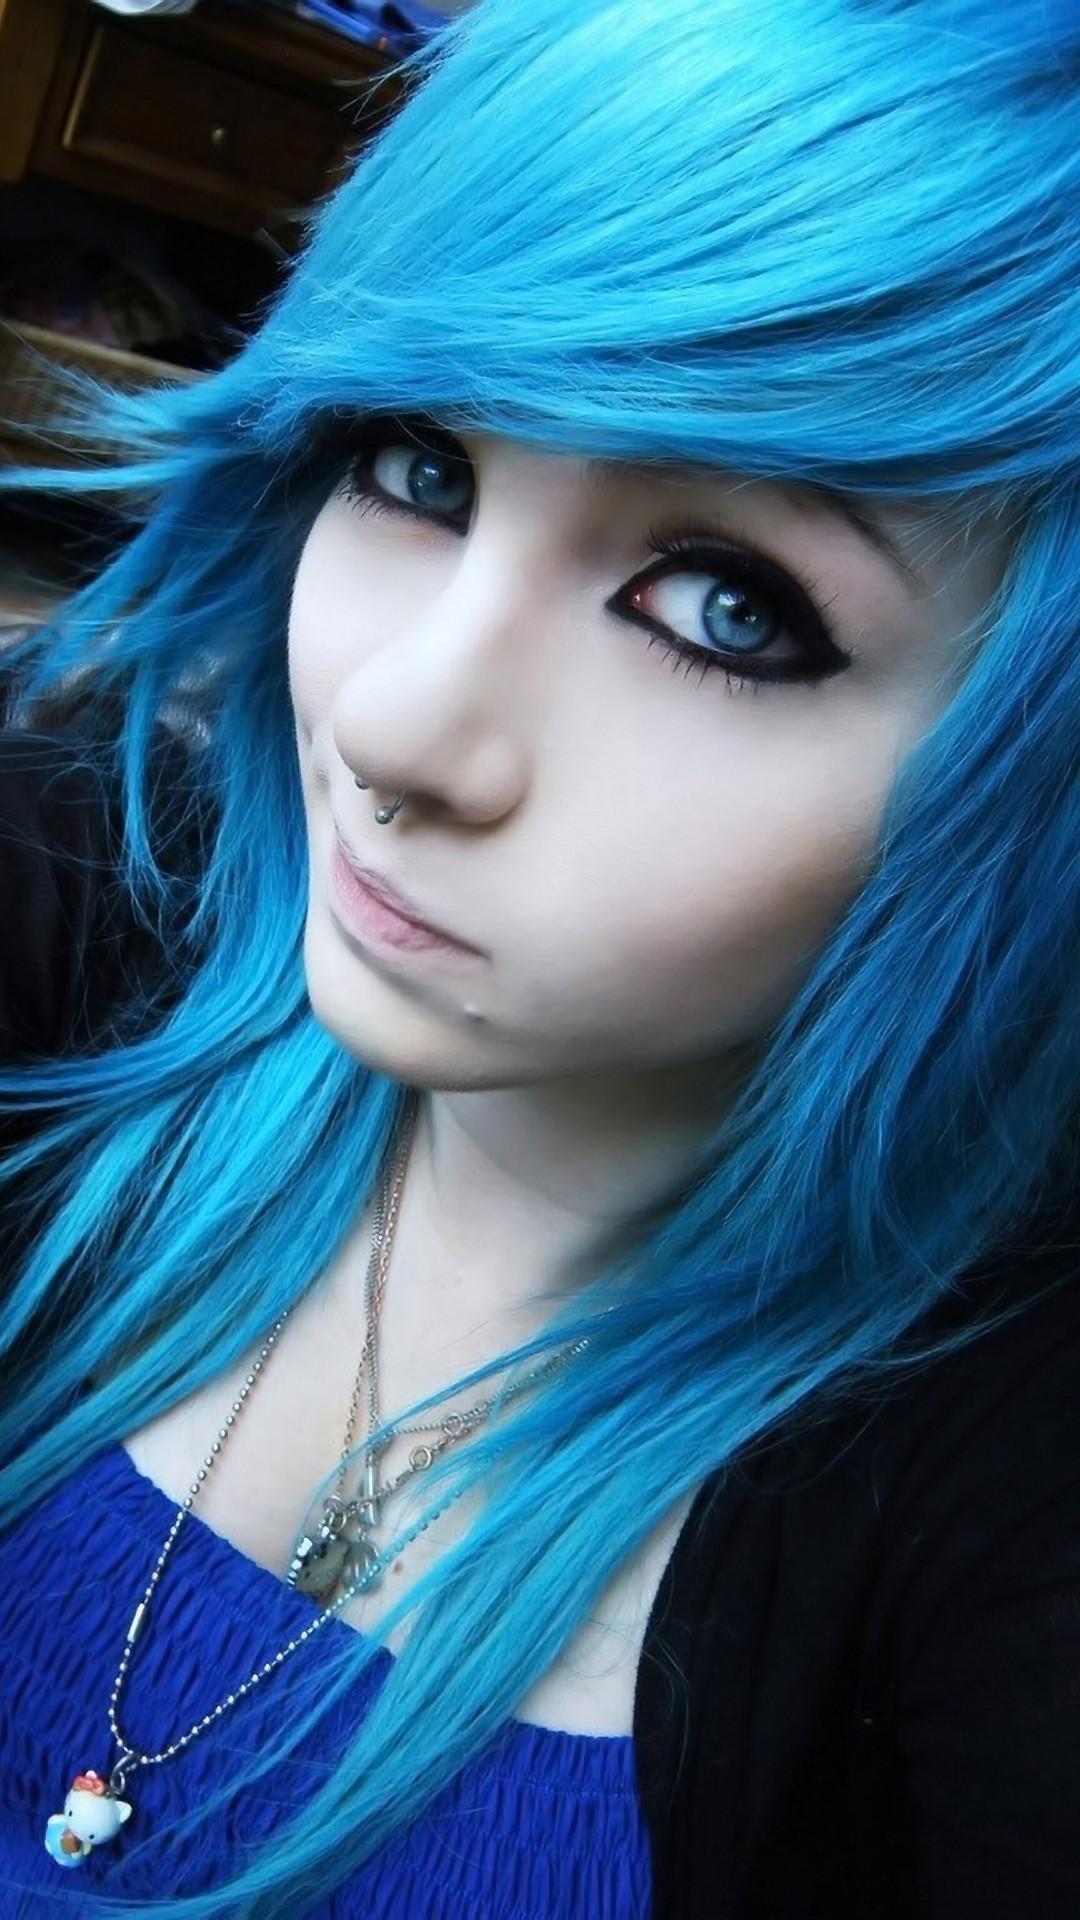 Girl iphone wallpaper amber mccrackin girl blue hair